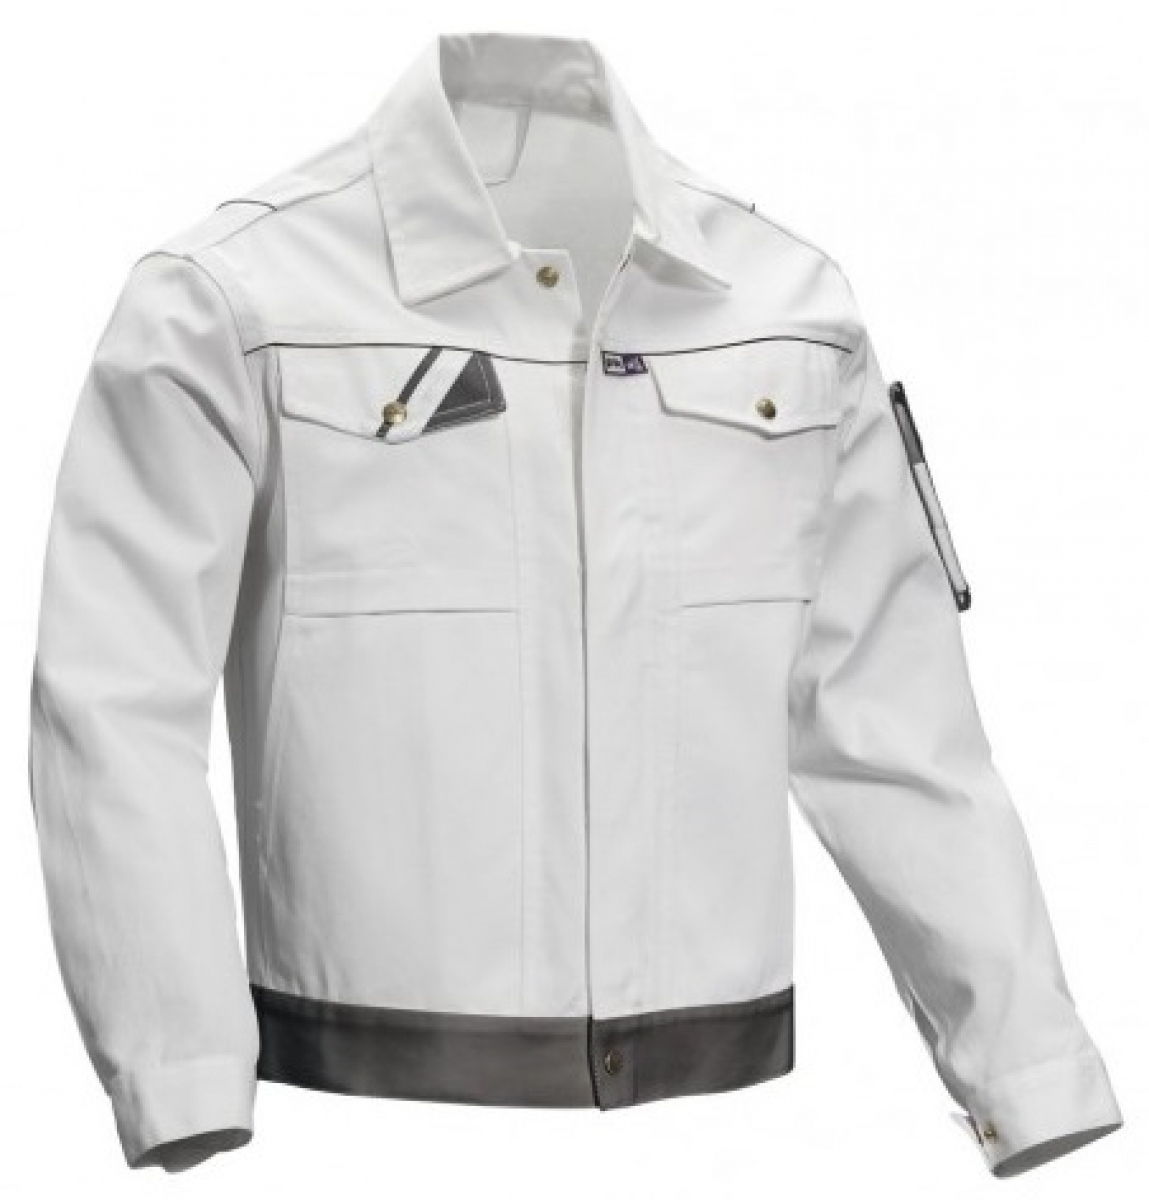 PKA-Arbeits-Berufs-Bund-Jacke, Blouson, Threeline Perfekt, MG320, weiß